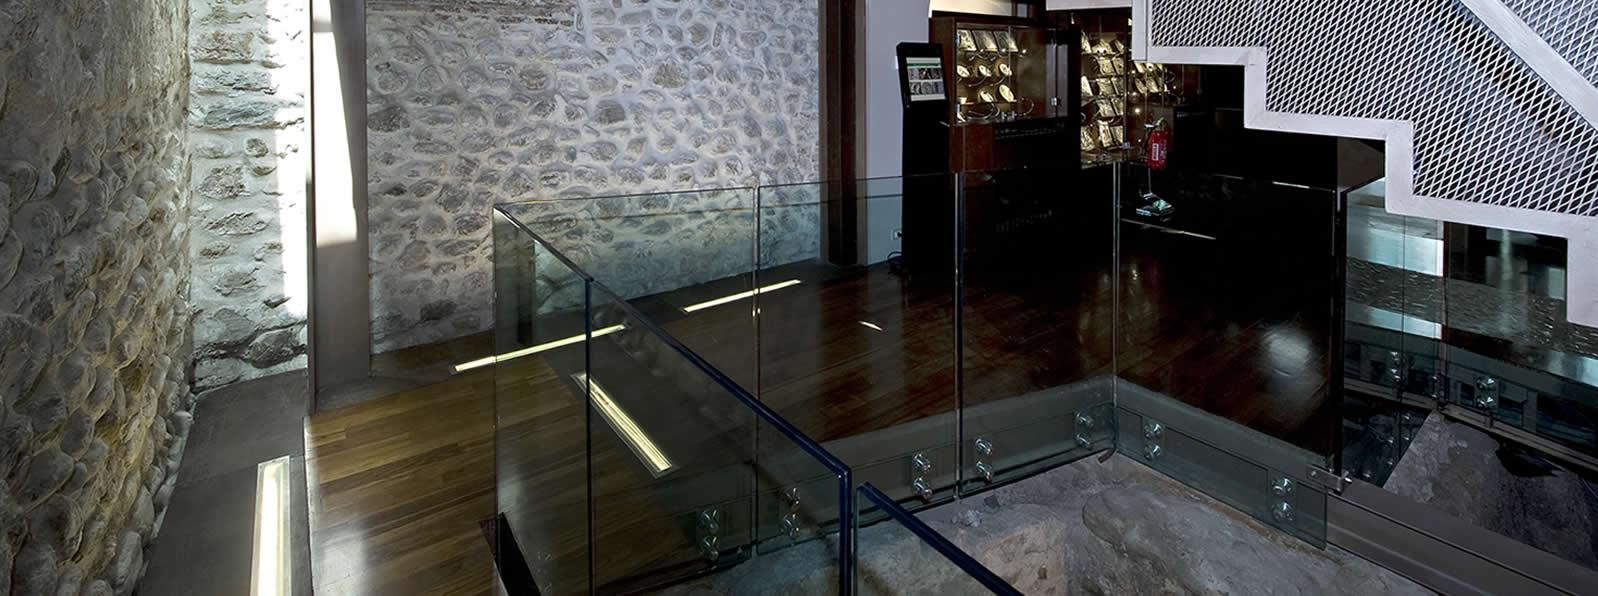 Paino-terra-scala-e-scavi-e-vetrine2